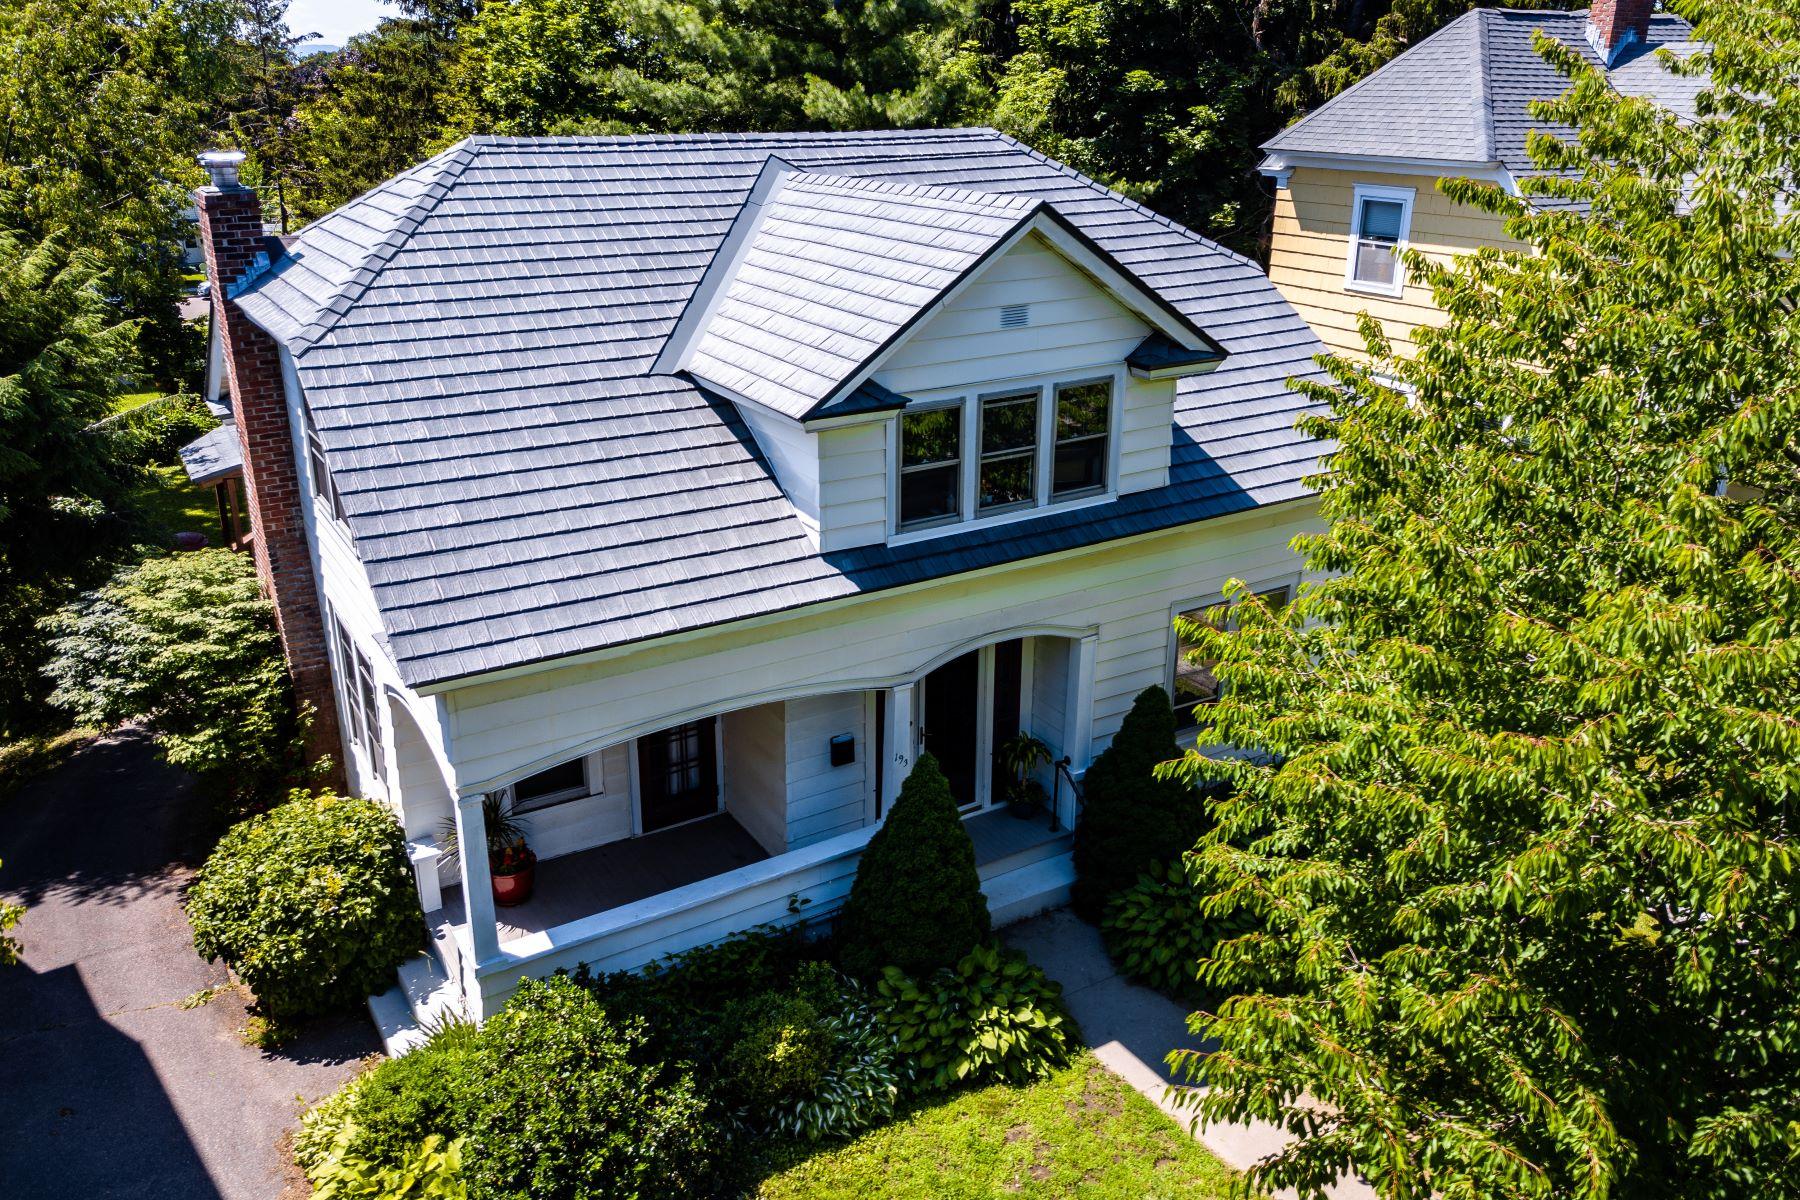 Single Family Homes for Sale at 193 Shelburne Street, Burlington 193 Shelburne St Burlington, Vermont 05401 United States